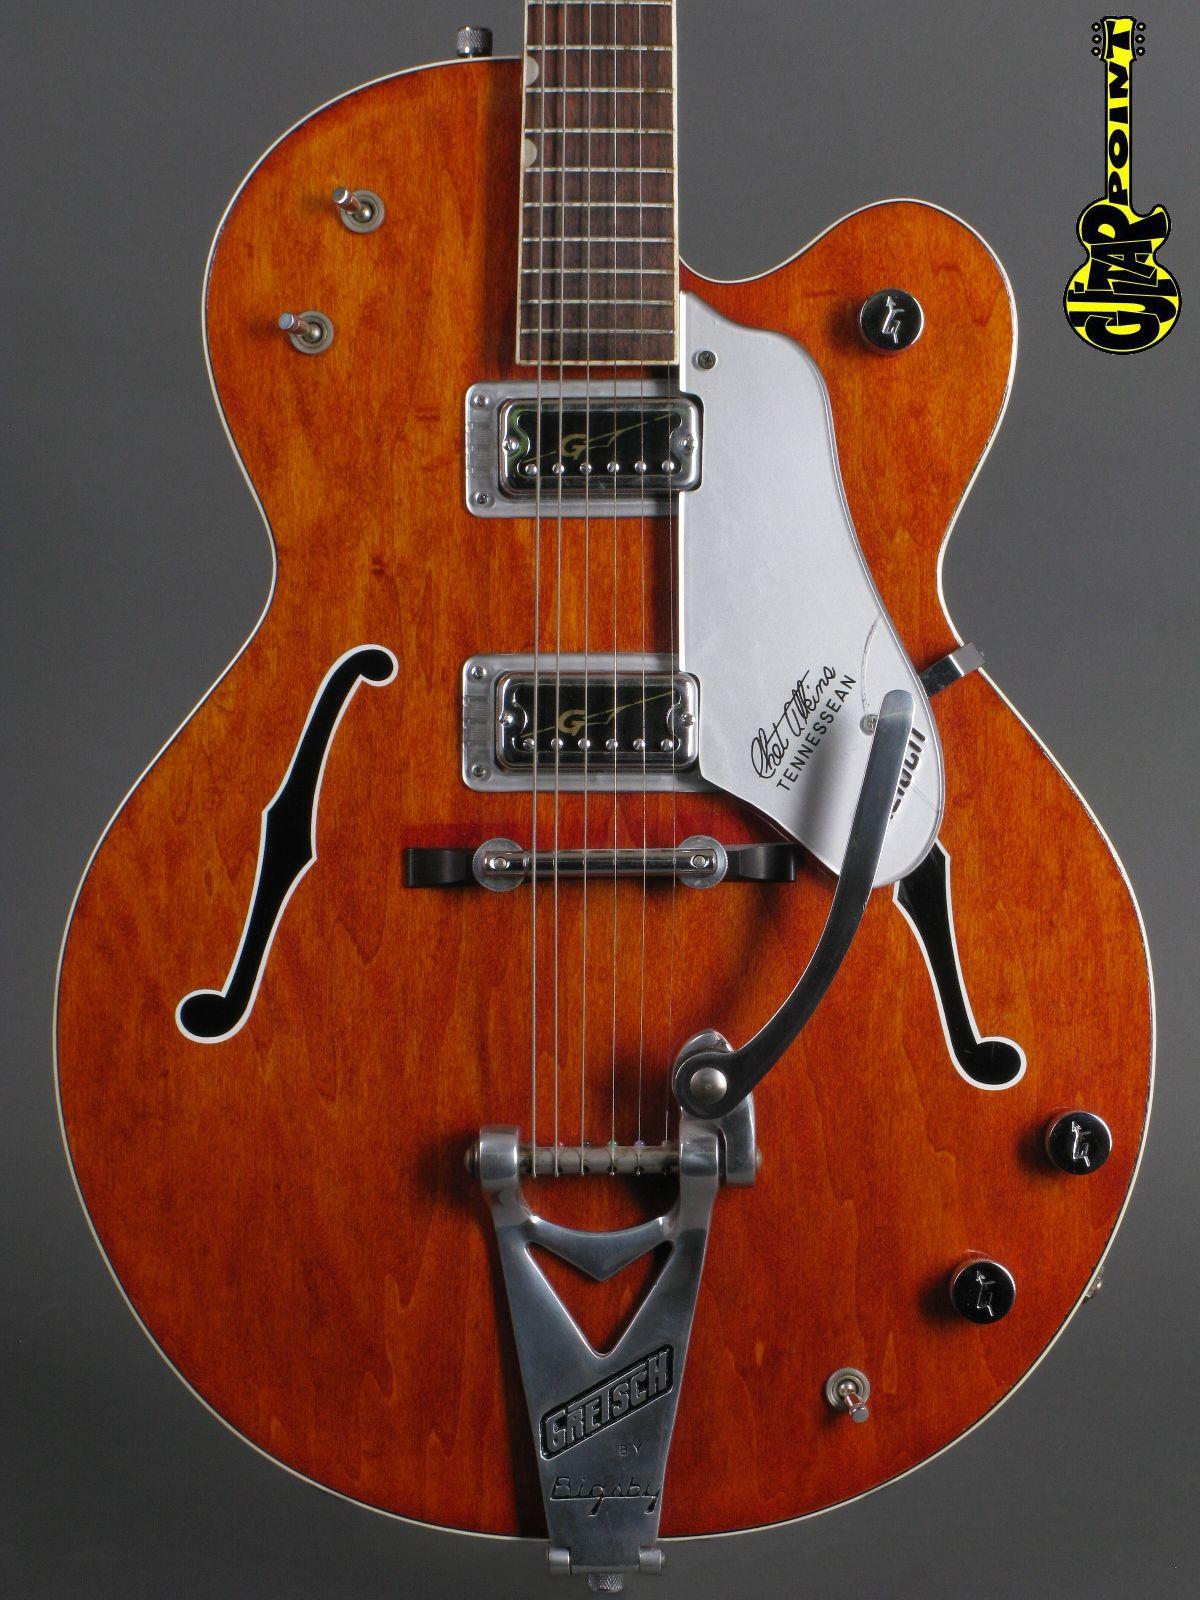 1966 Gretsch 6119 Chet Atkins Tennessean - Minty !!!